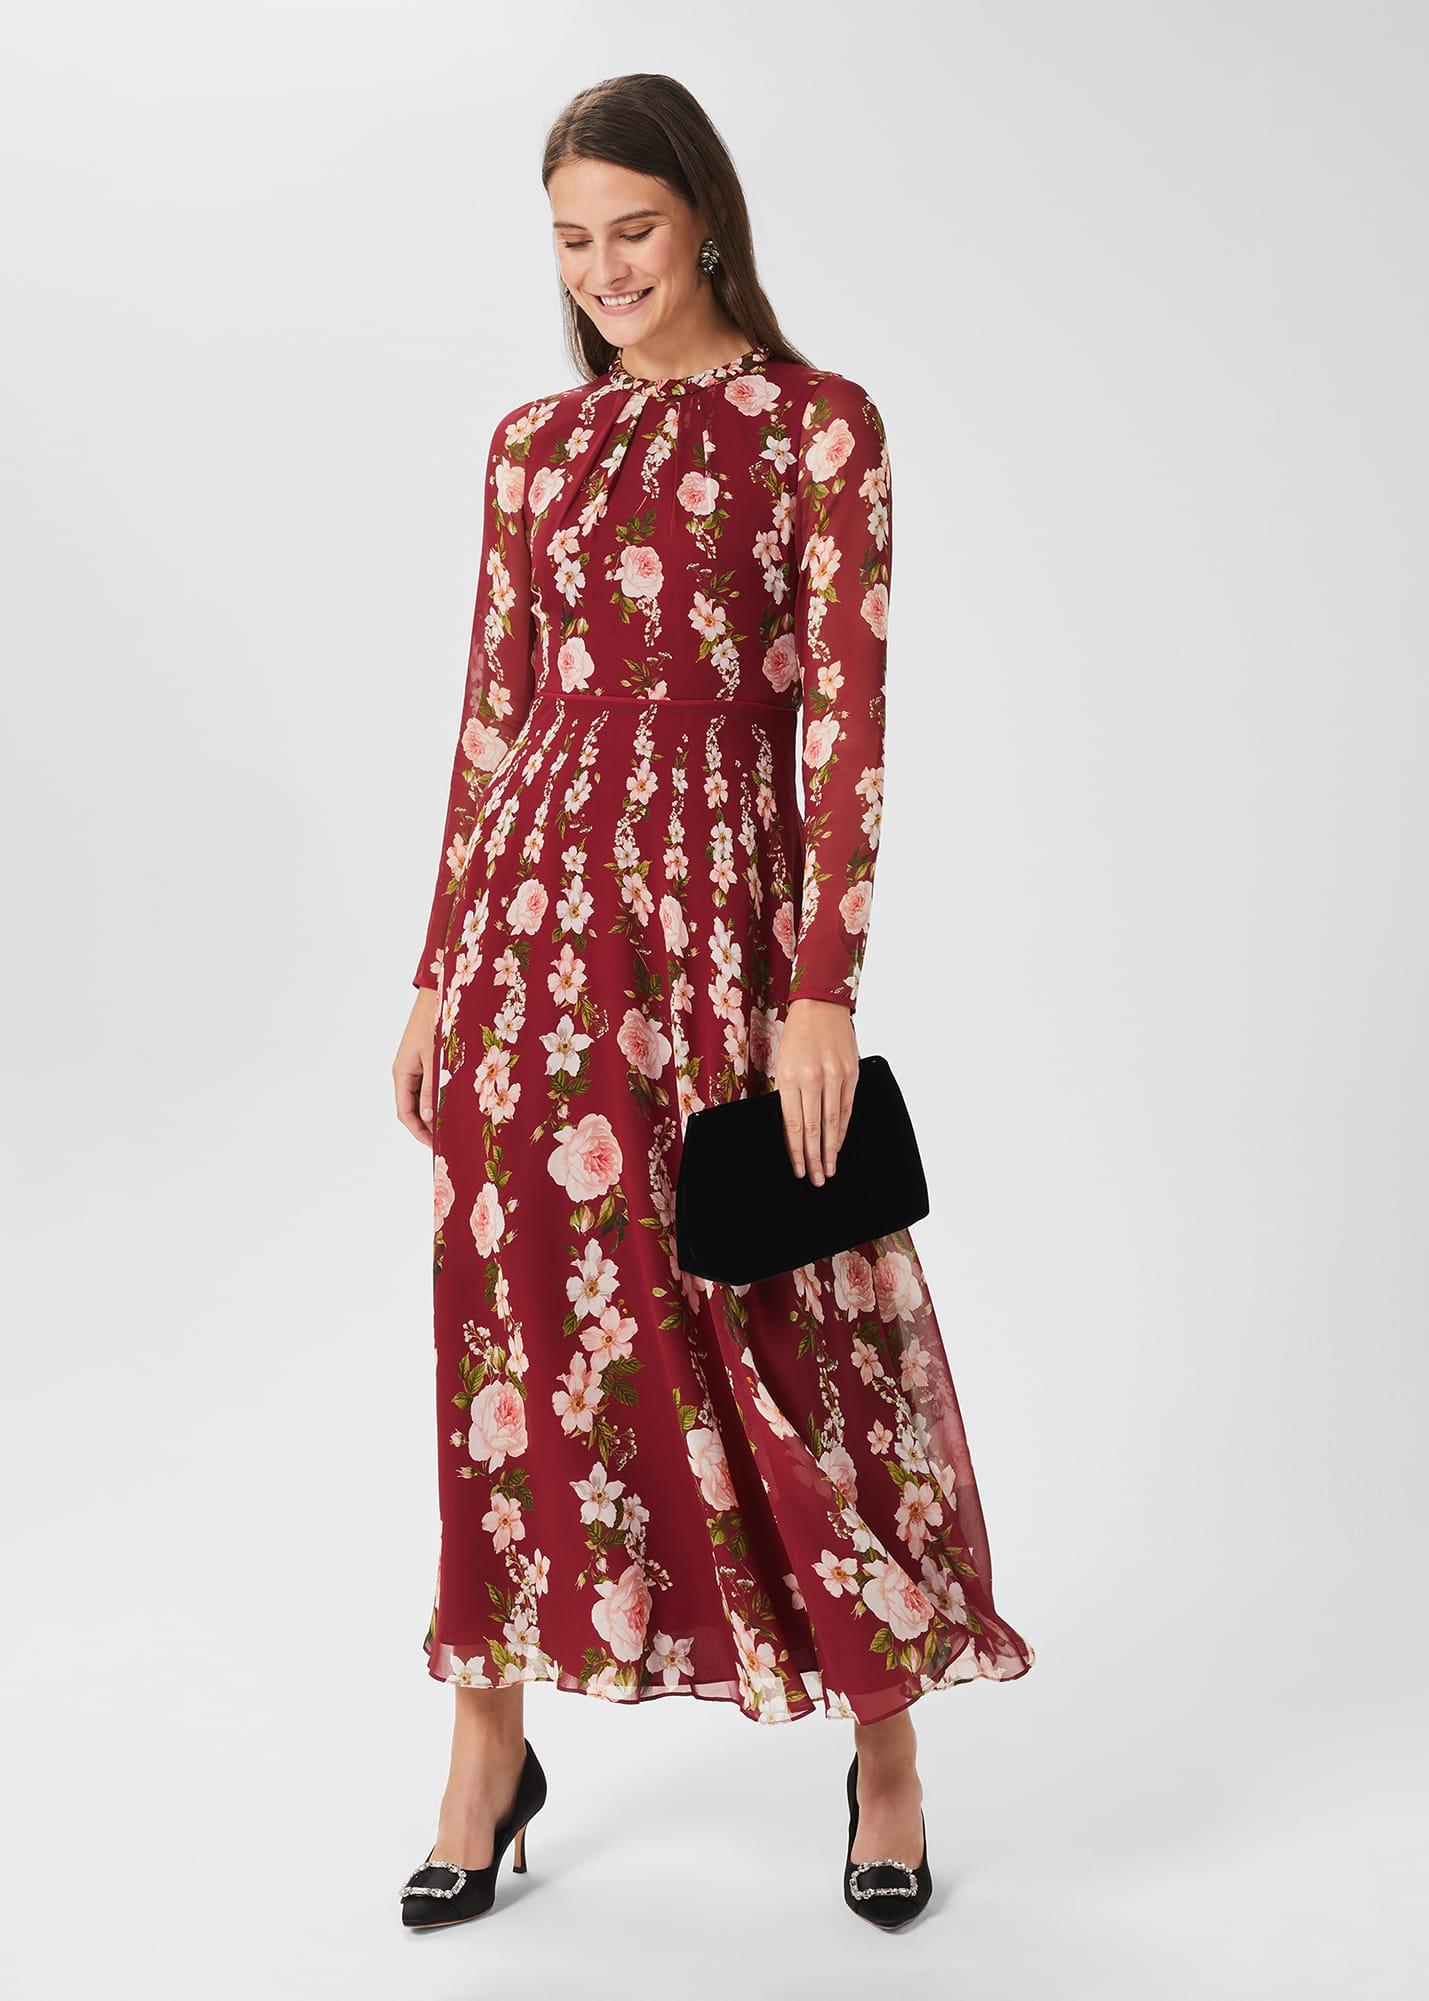 Hobbs Women Rosabelle Silk Floral Dress